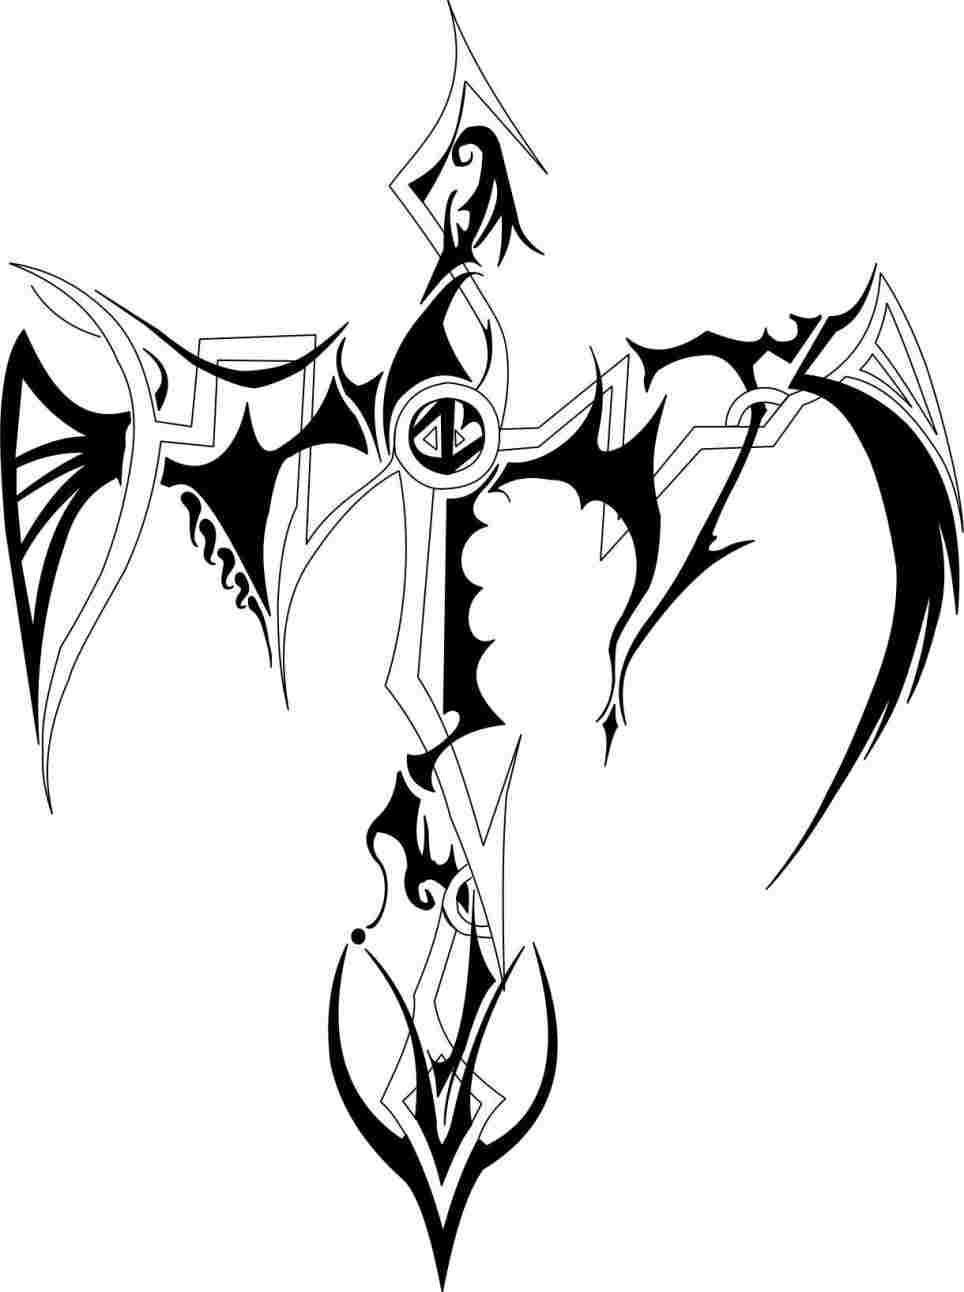 964x1292 Cross Tattoo Drawings In Pencil